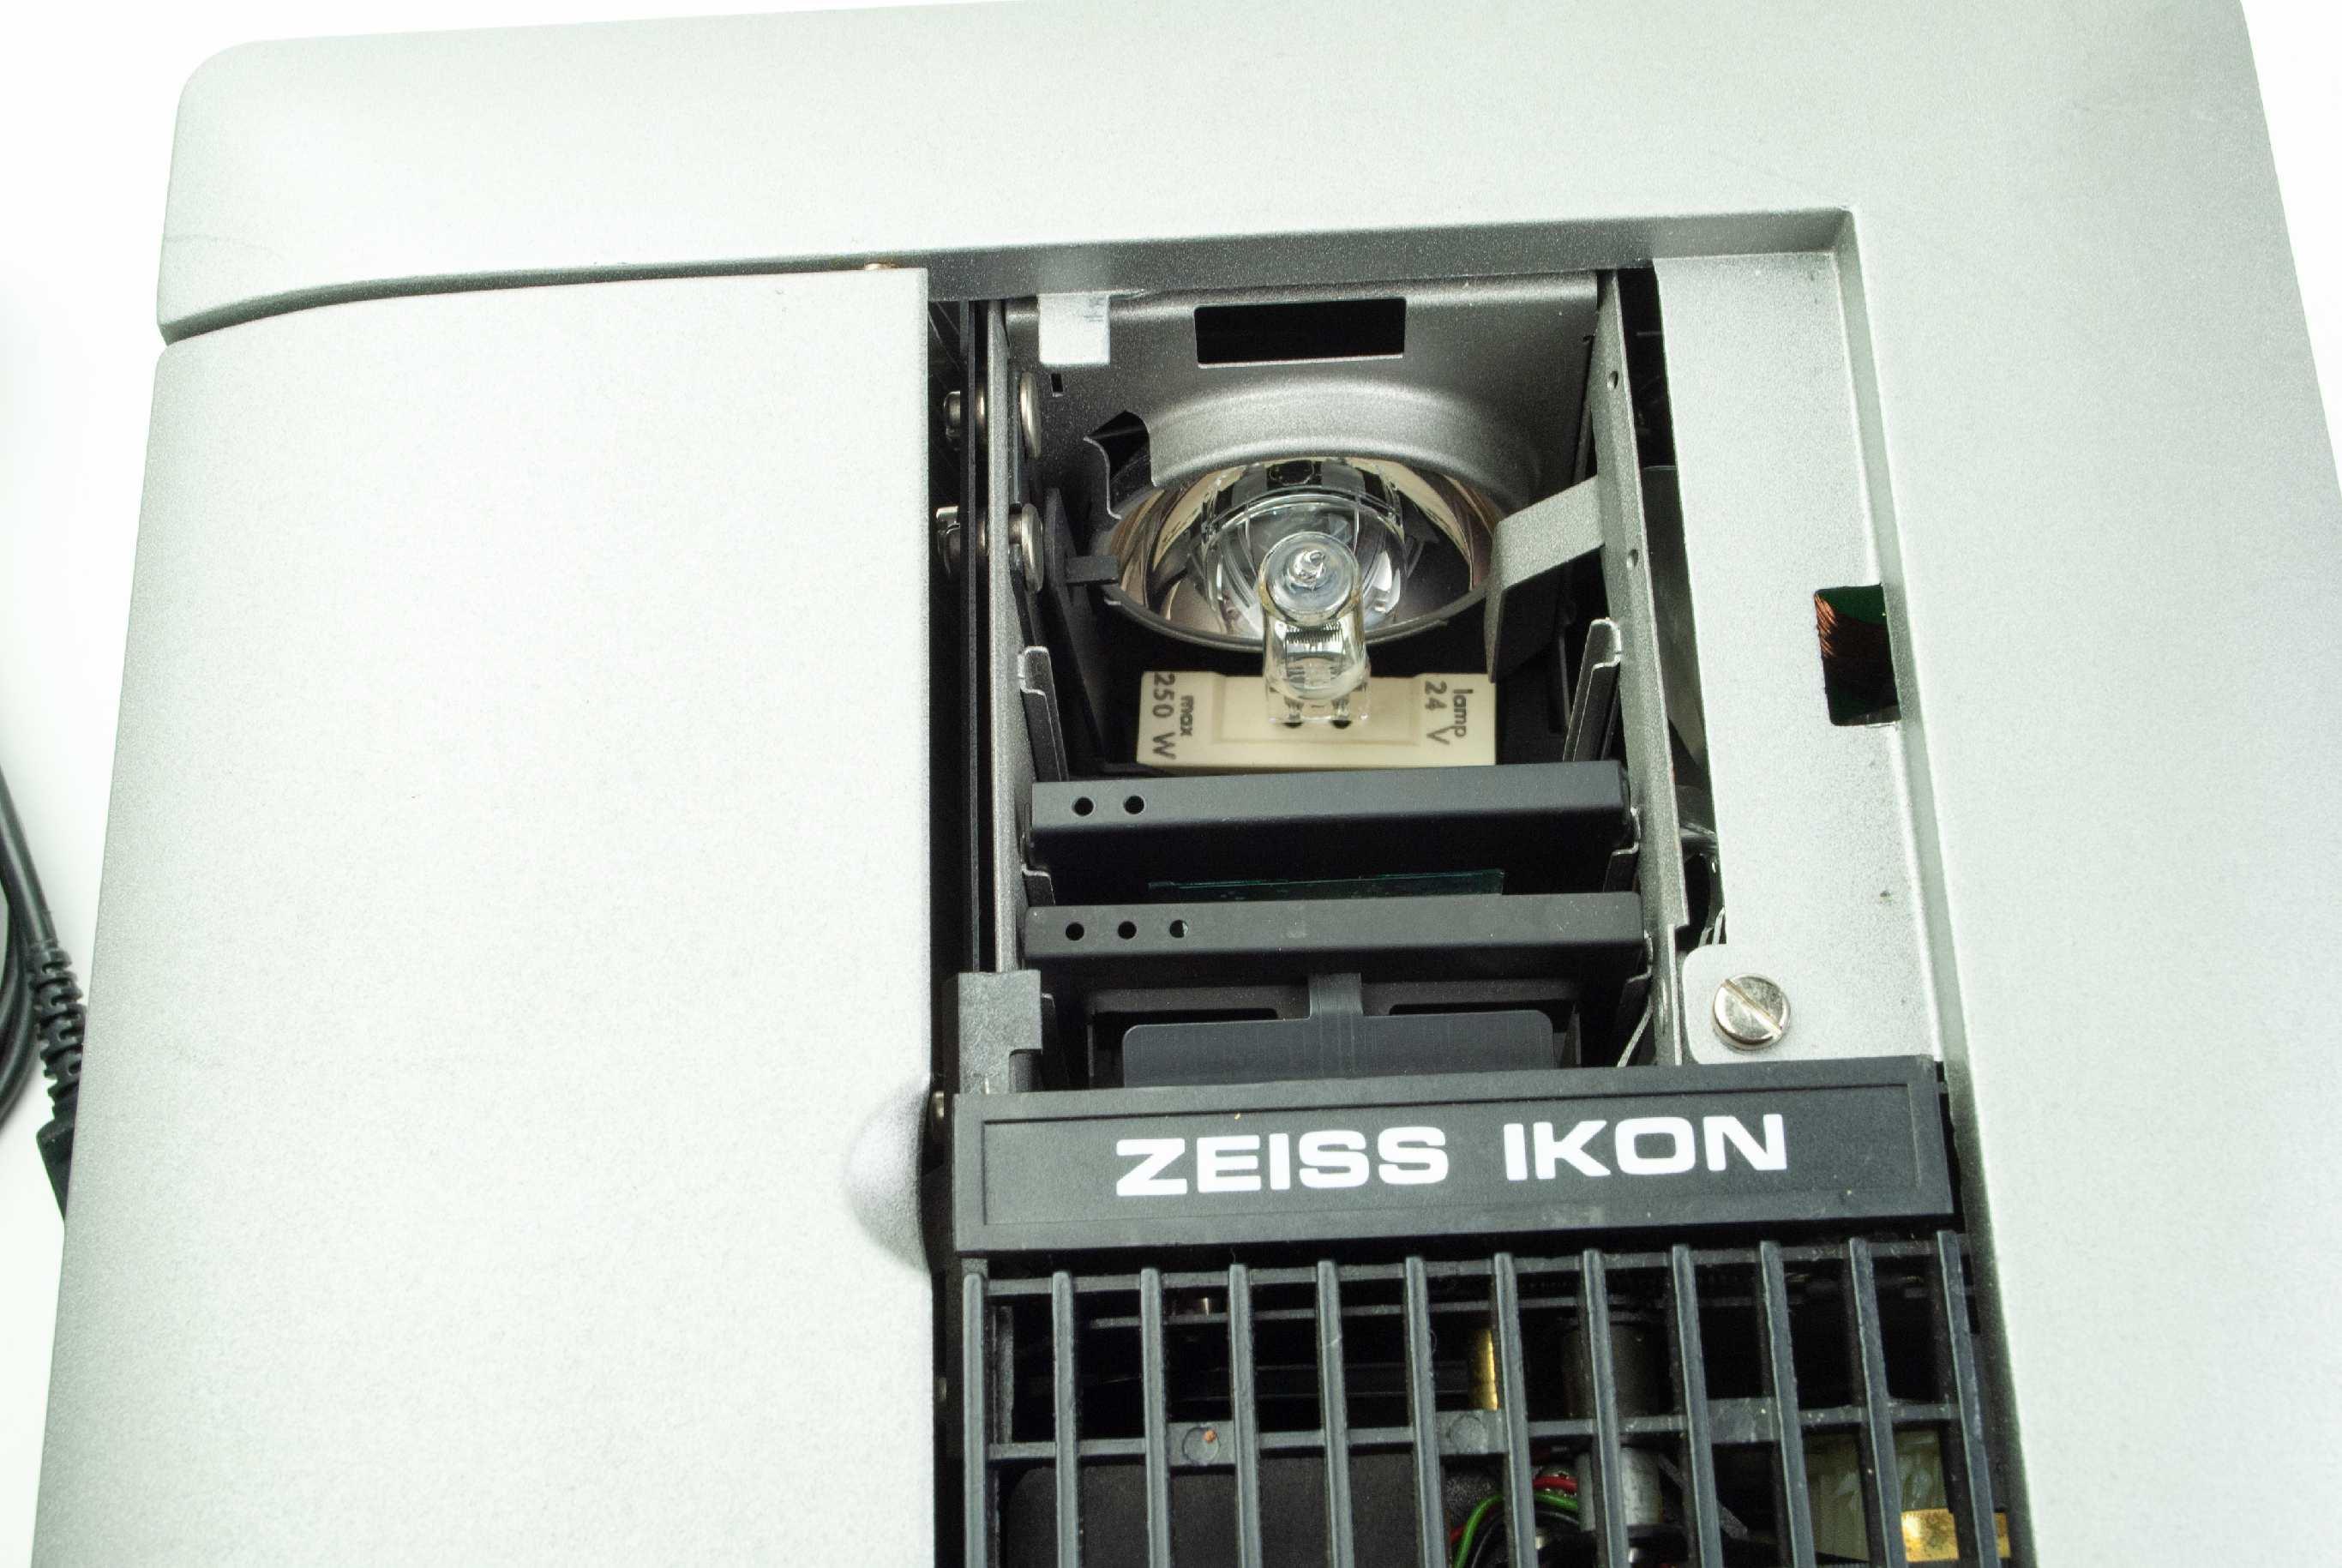 Unimat 75 Manual Kubota F2880 Wiring Diagram Array Zeiss Ikon 2500 Slide Projectors Spare Parts And Rh Van